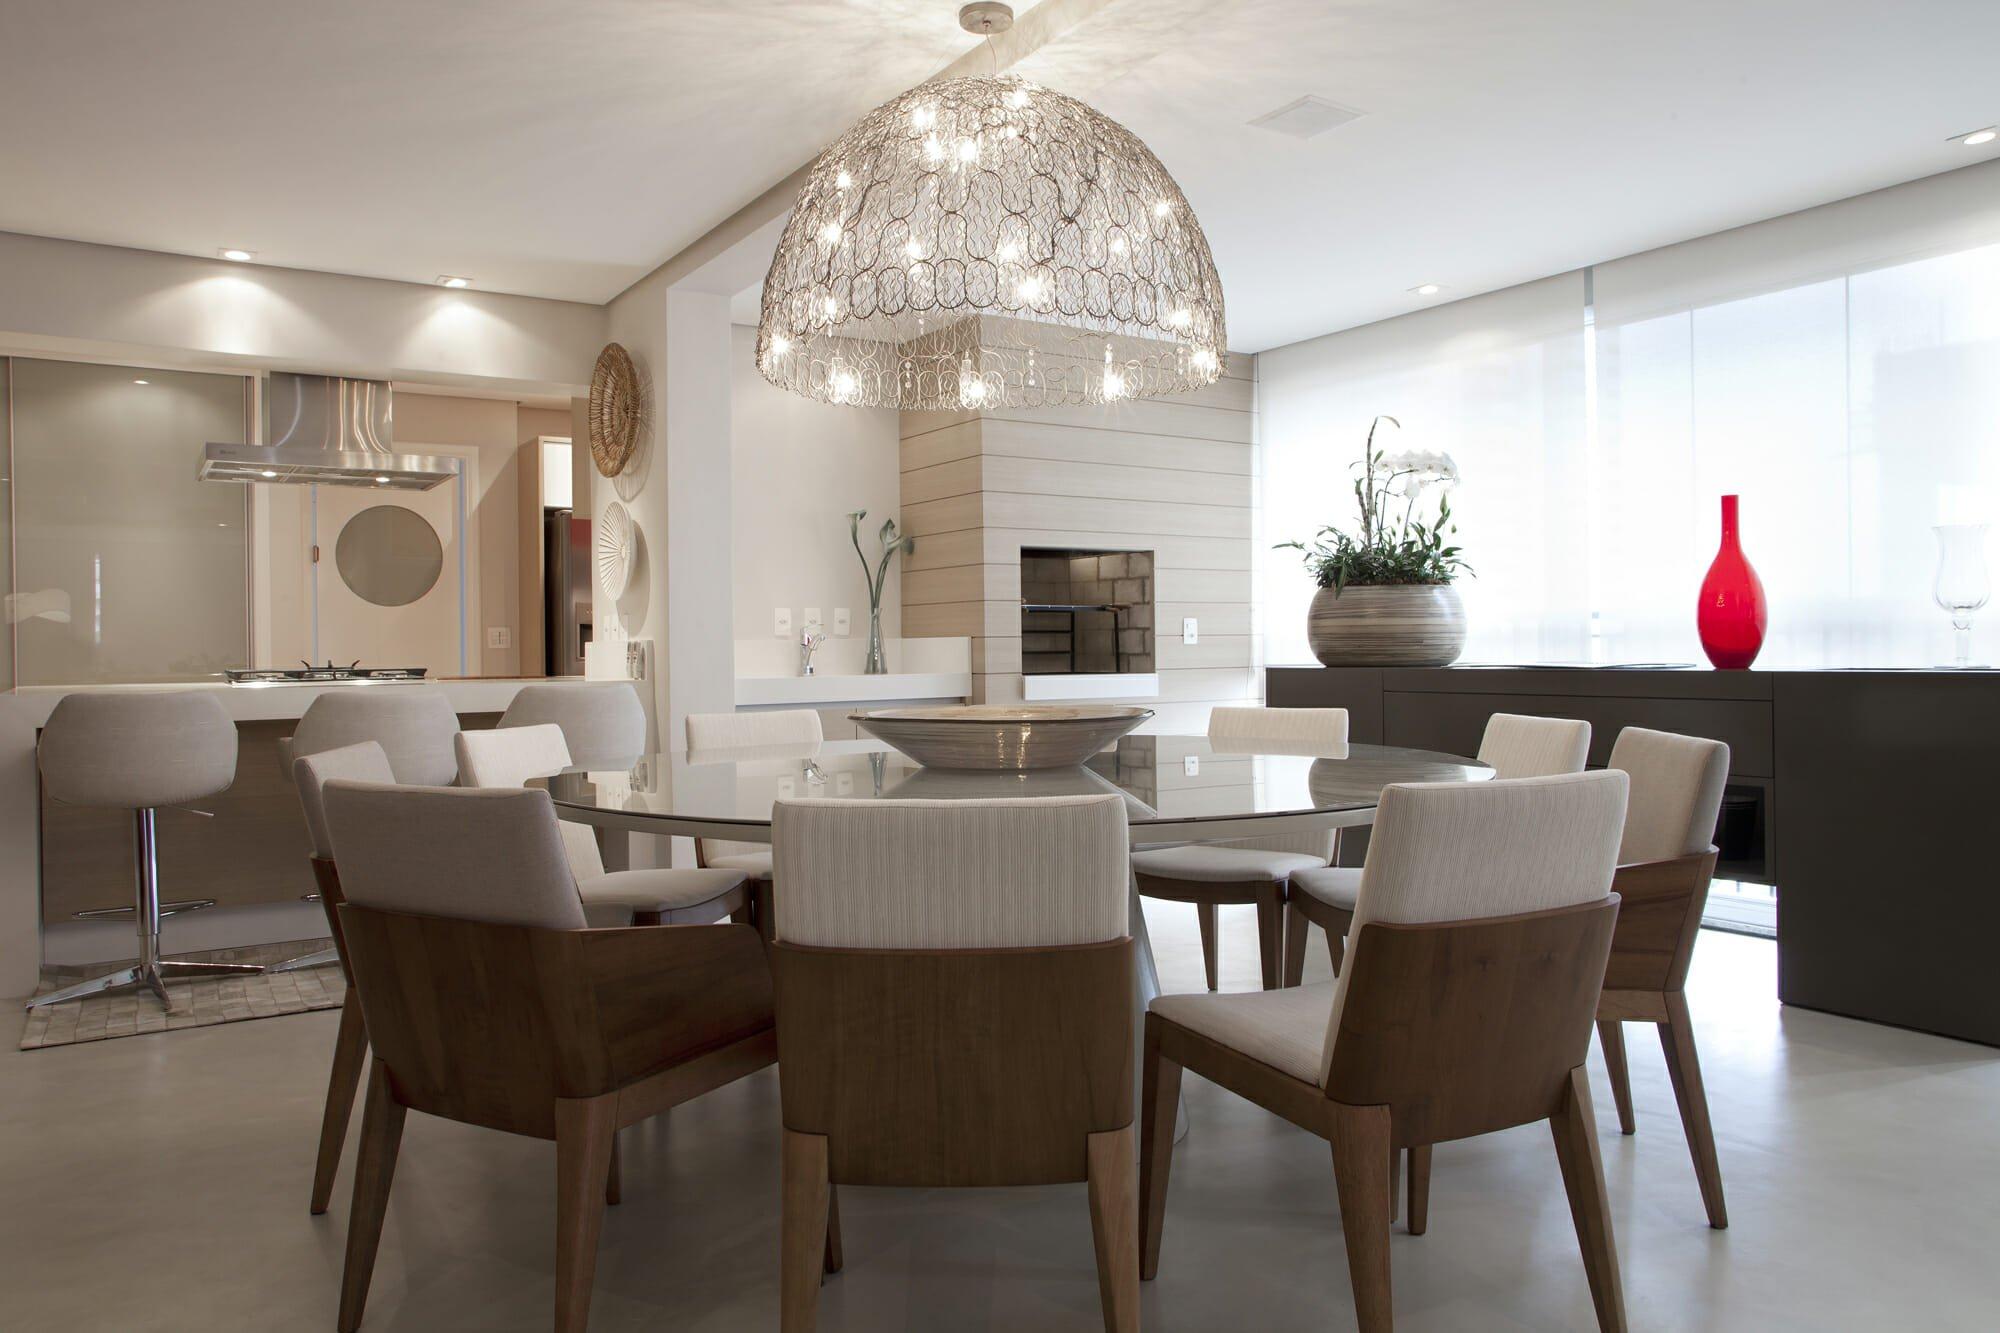 orlando-interior-design-help-maria-alice-aguilar-dining-room